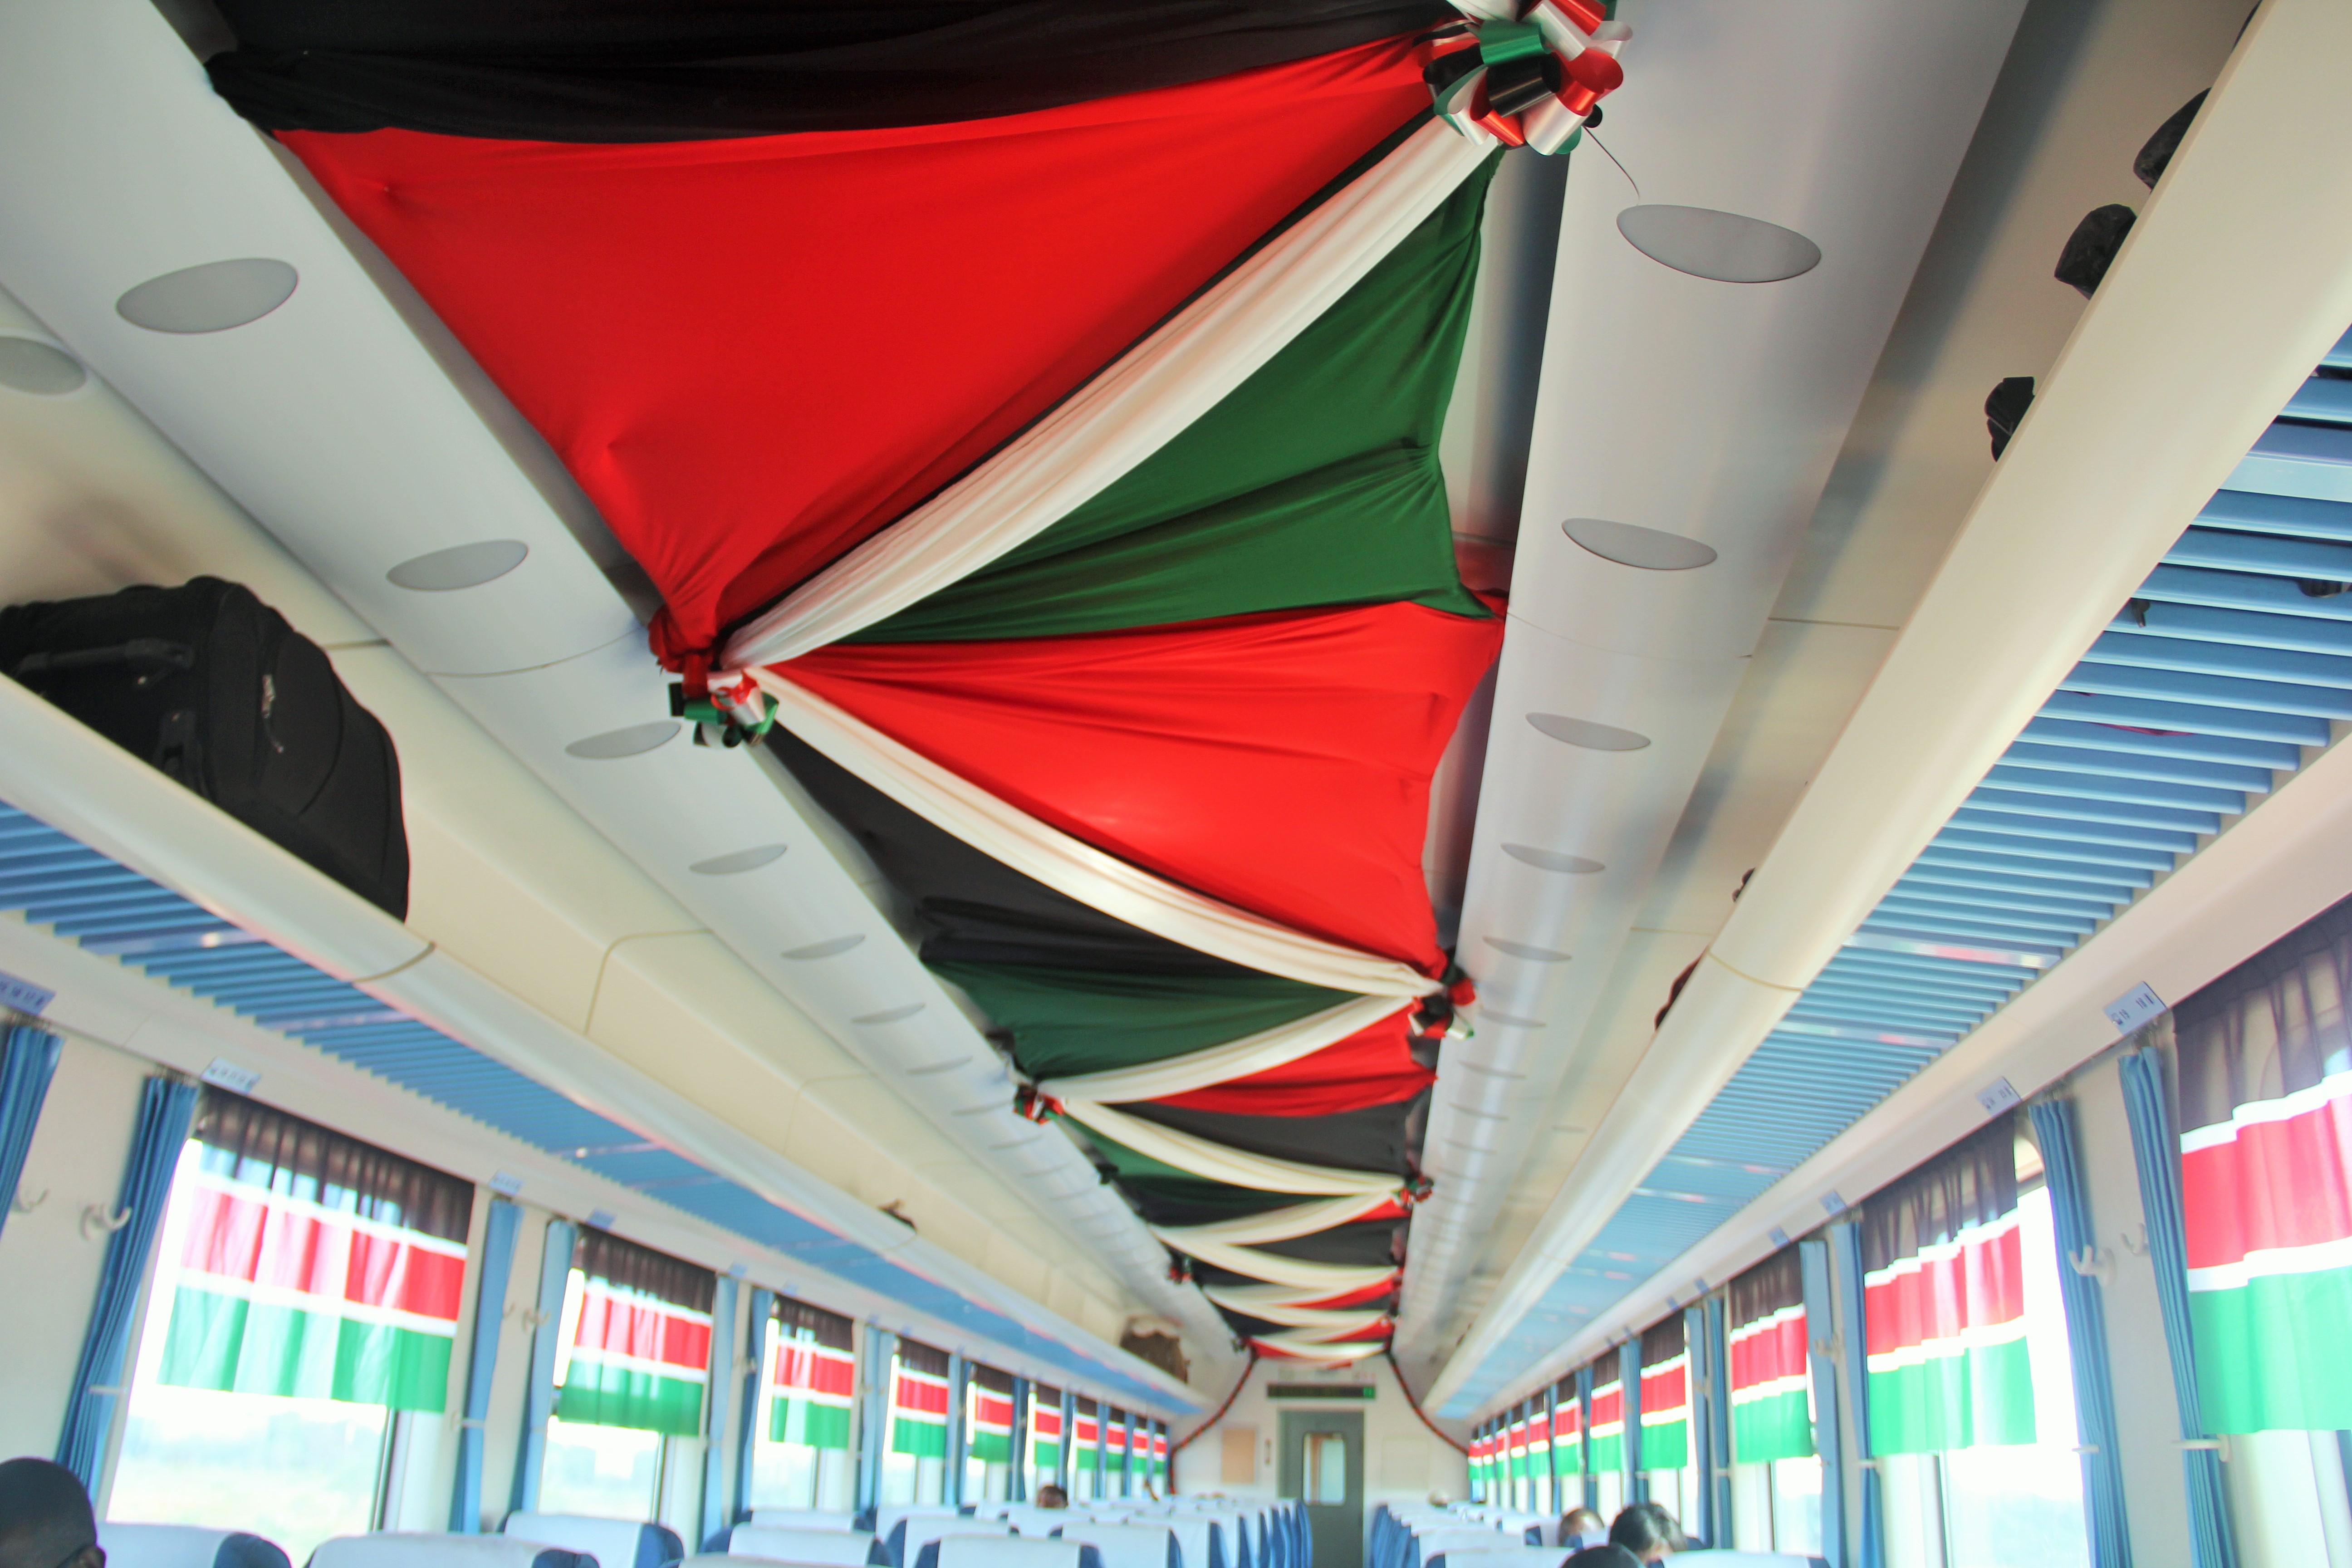 Inside the Madara Express train.